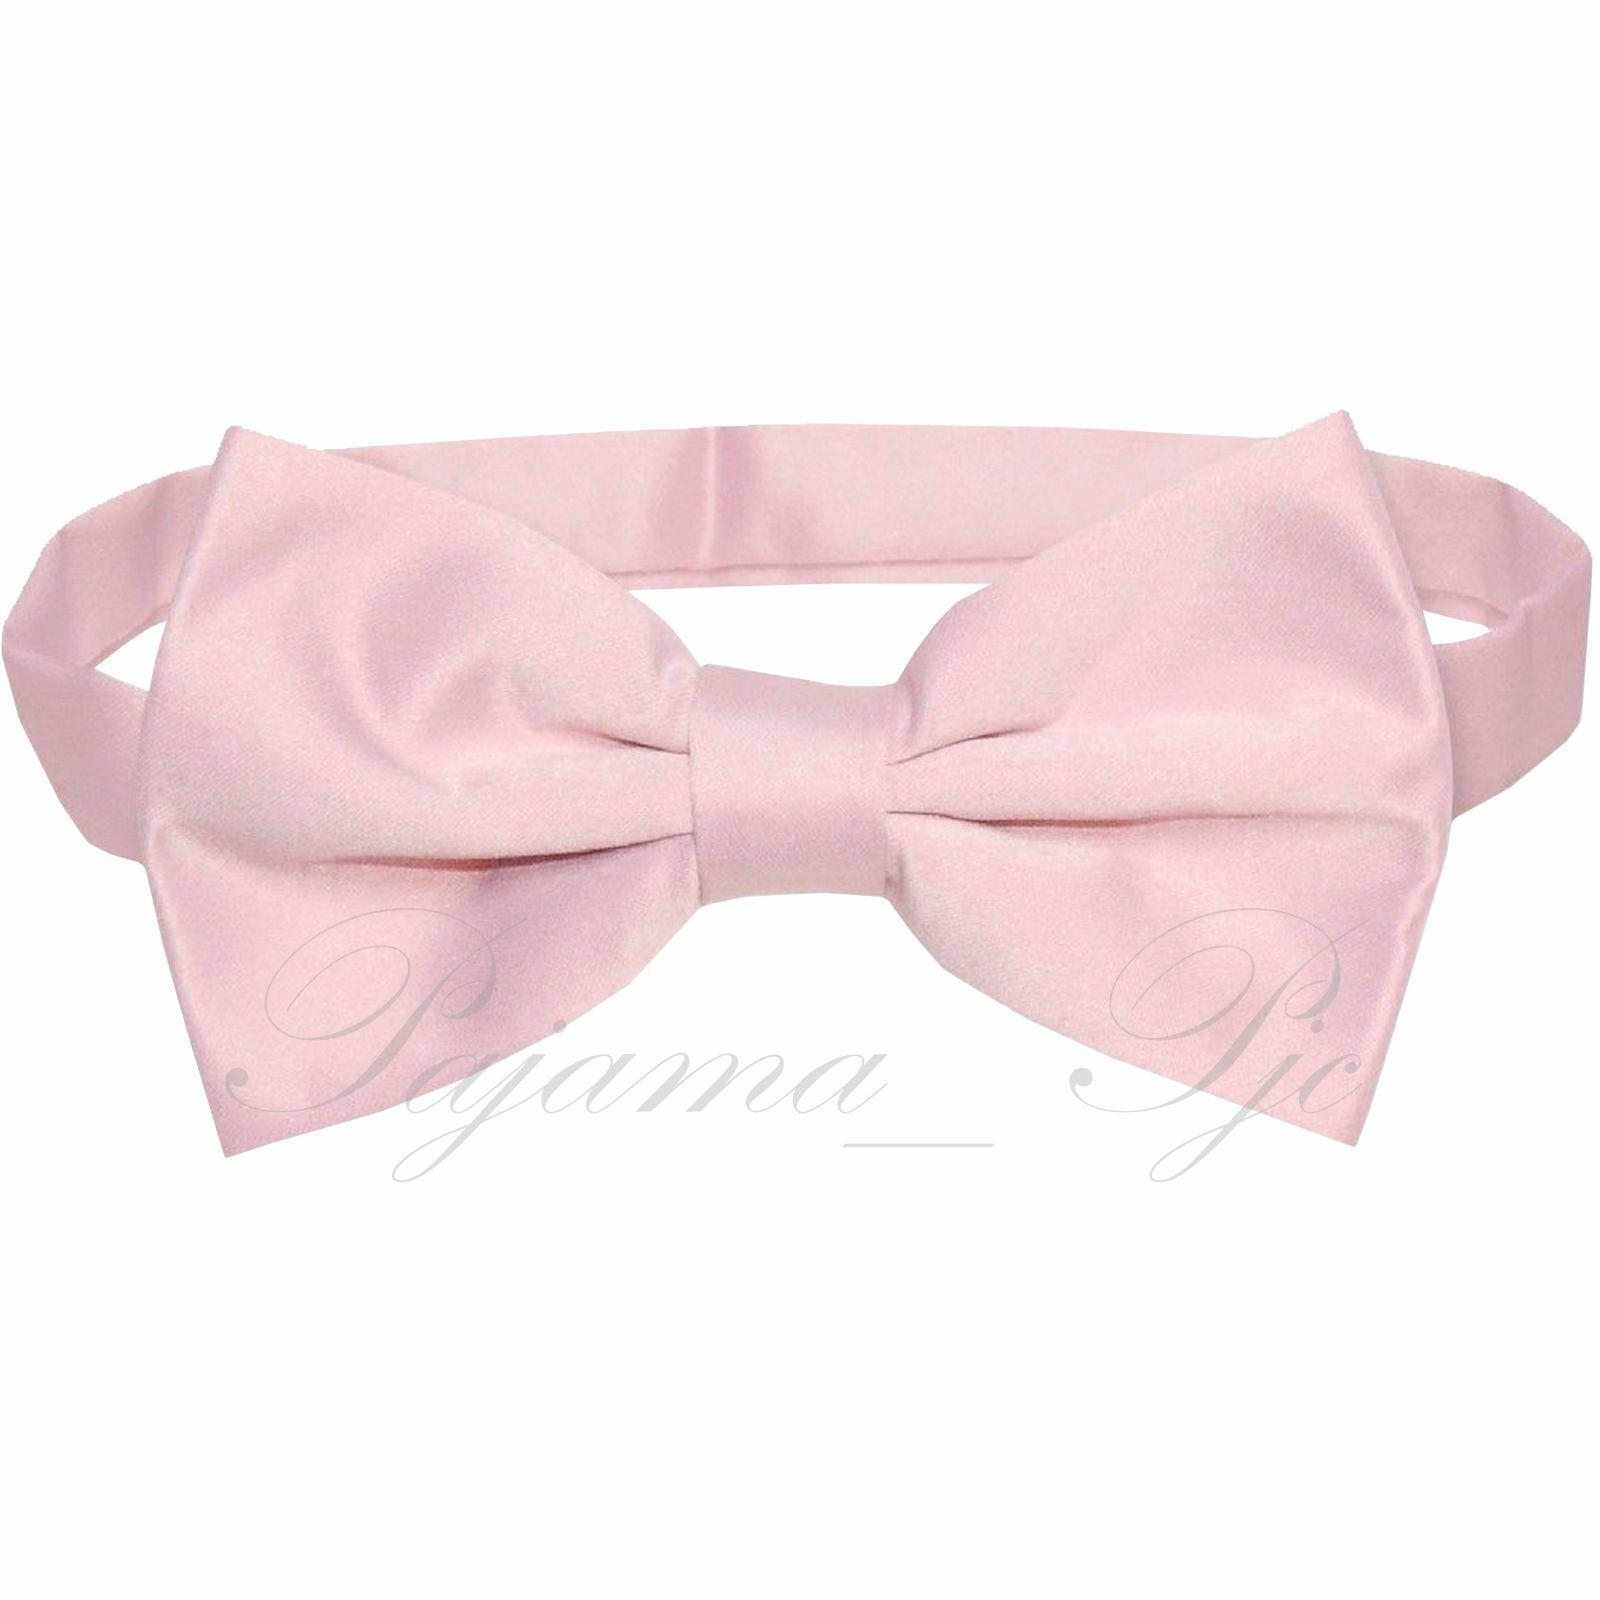 Classic New Pink Mens vorgebunden Tie Bow Tie Wedding Party